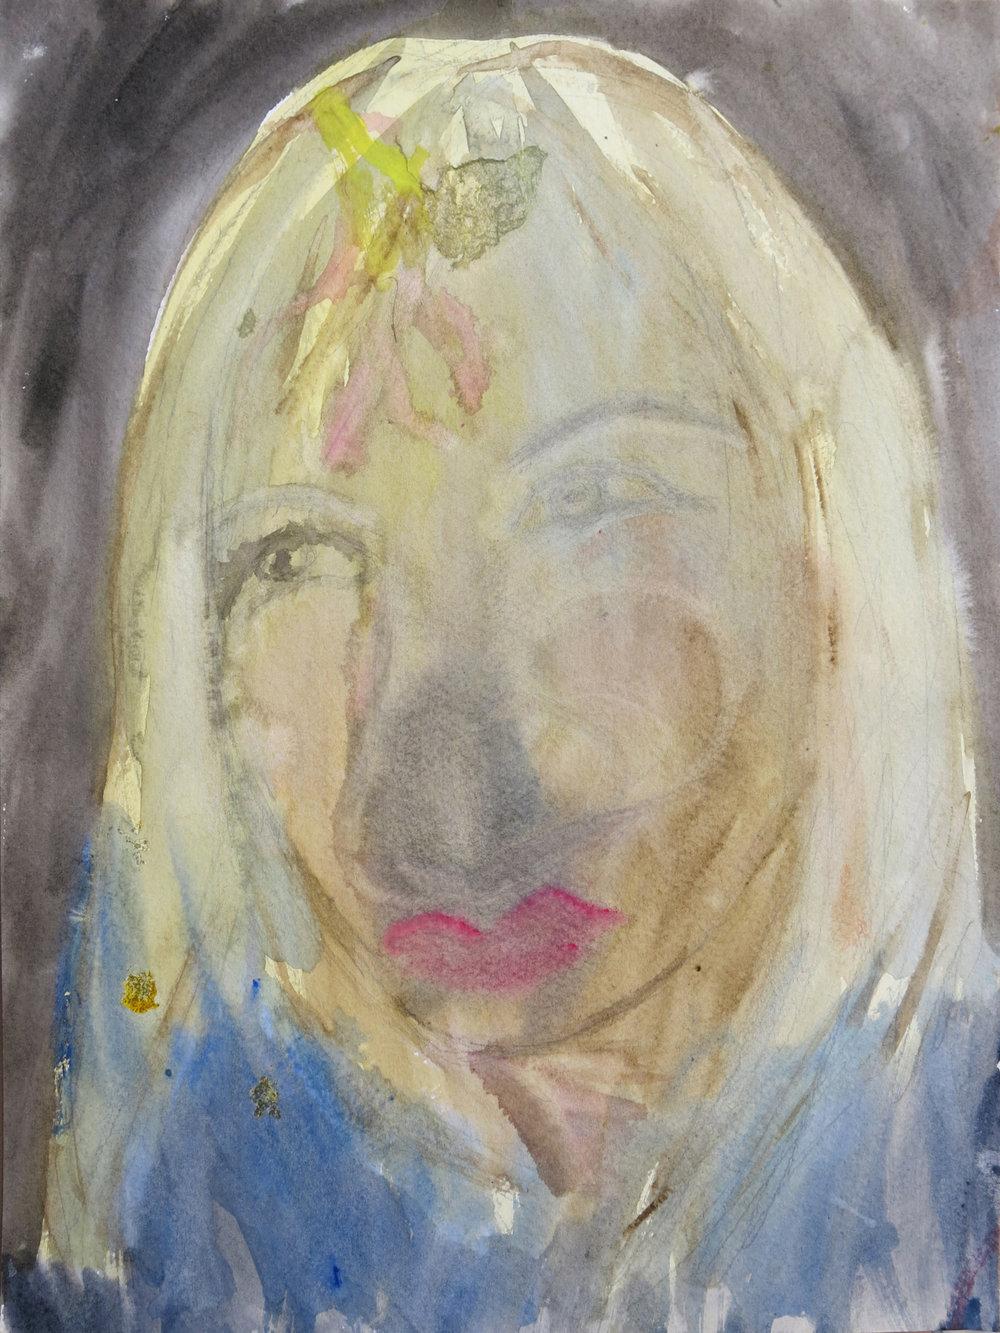 Barbra Streisand Portrait #146